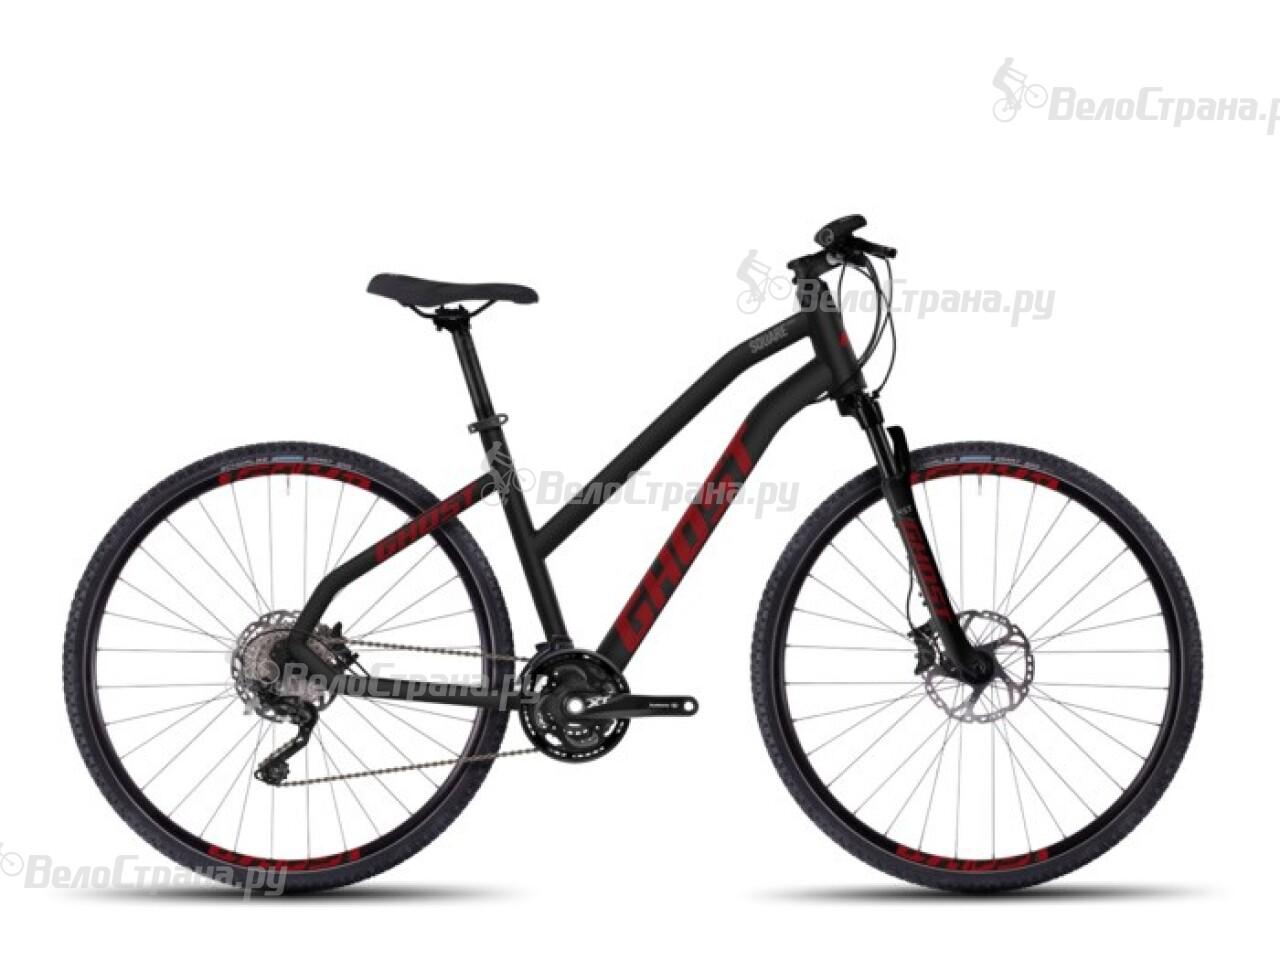 Велосипед Ghost SQUARE Cross 7 Miss (2016) велосипед ghost square cross x 2 2016